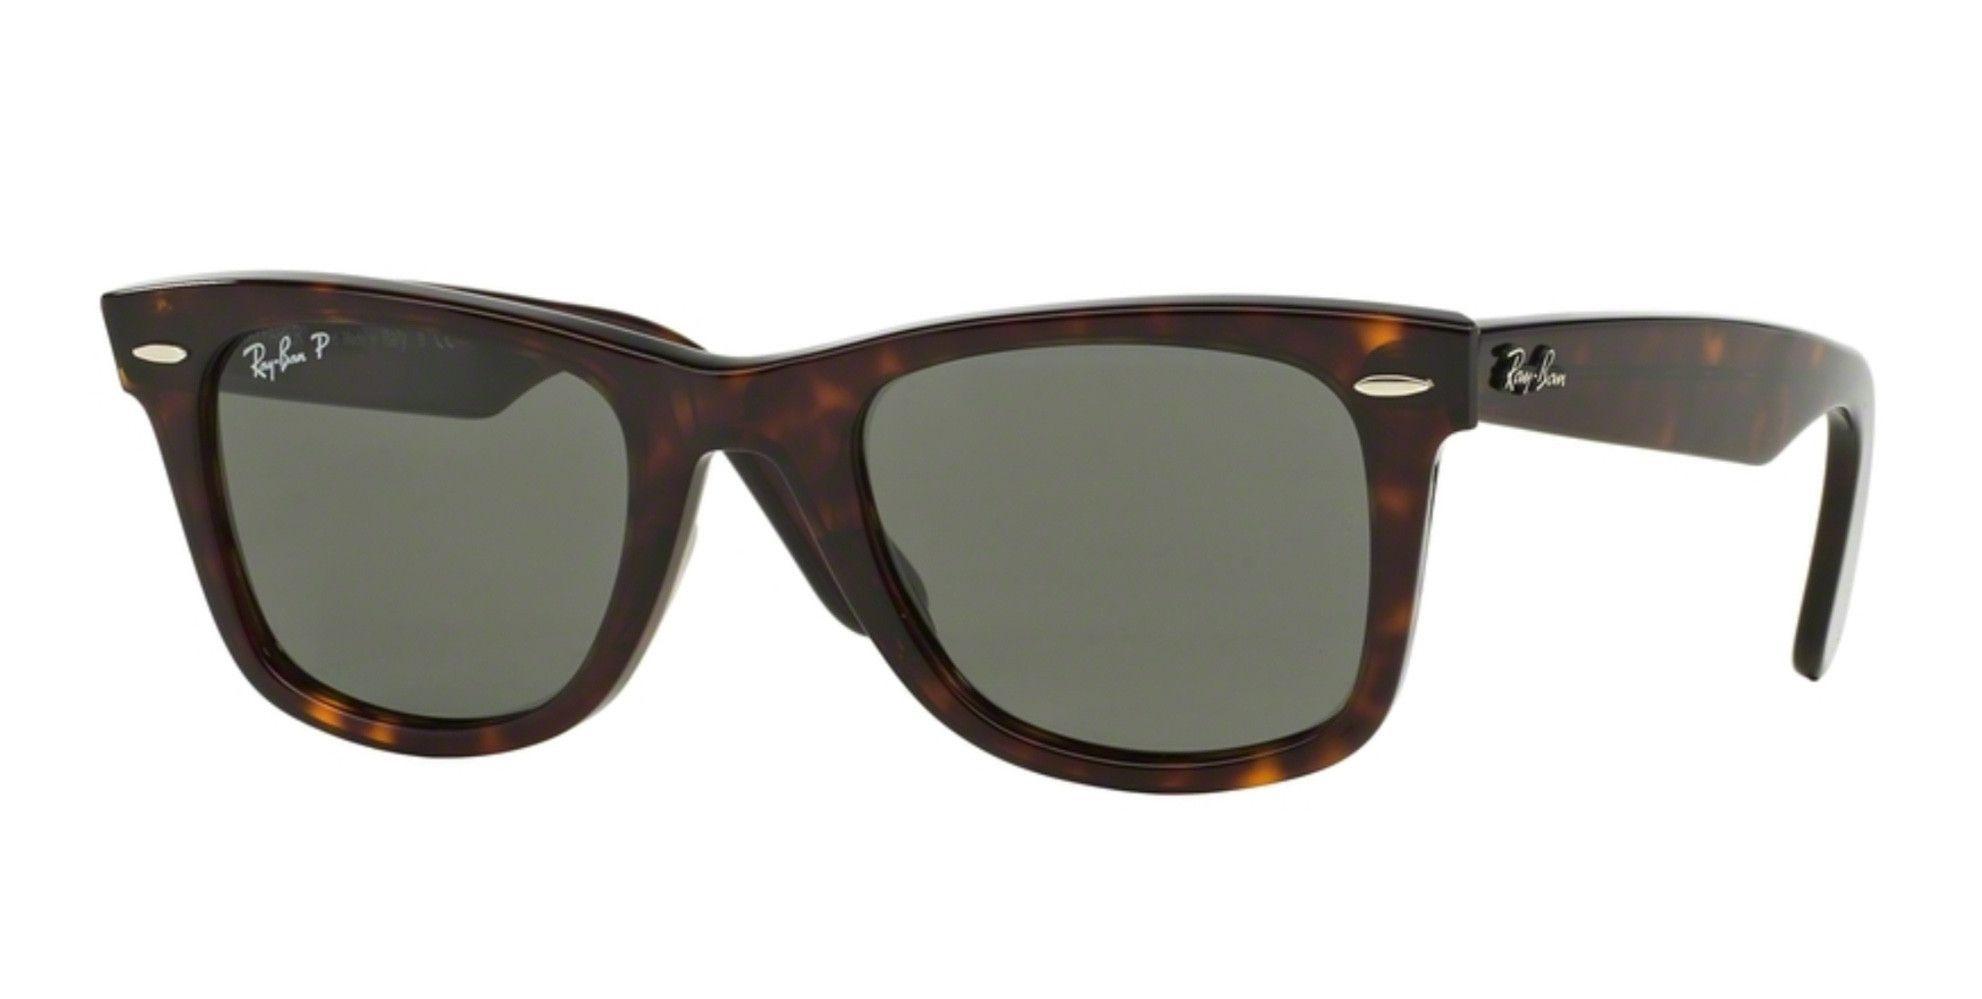 Ray-Ban RB2140-902/58 Tortoise Shell Polarized Original Wayfarer Sunglasses